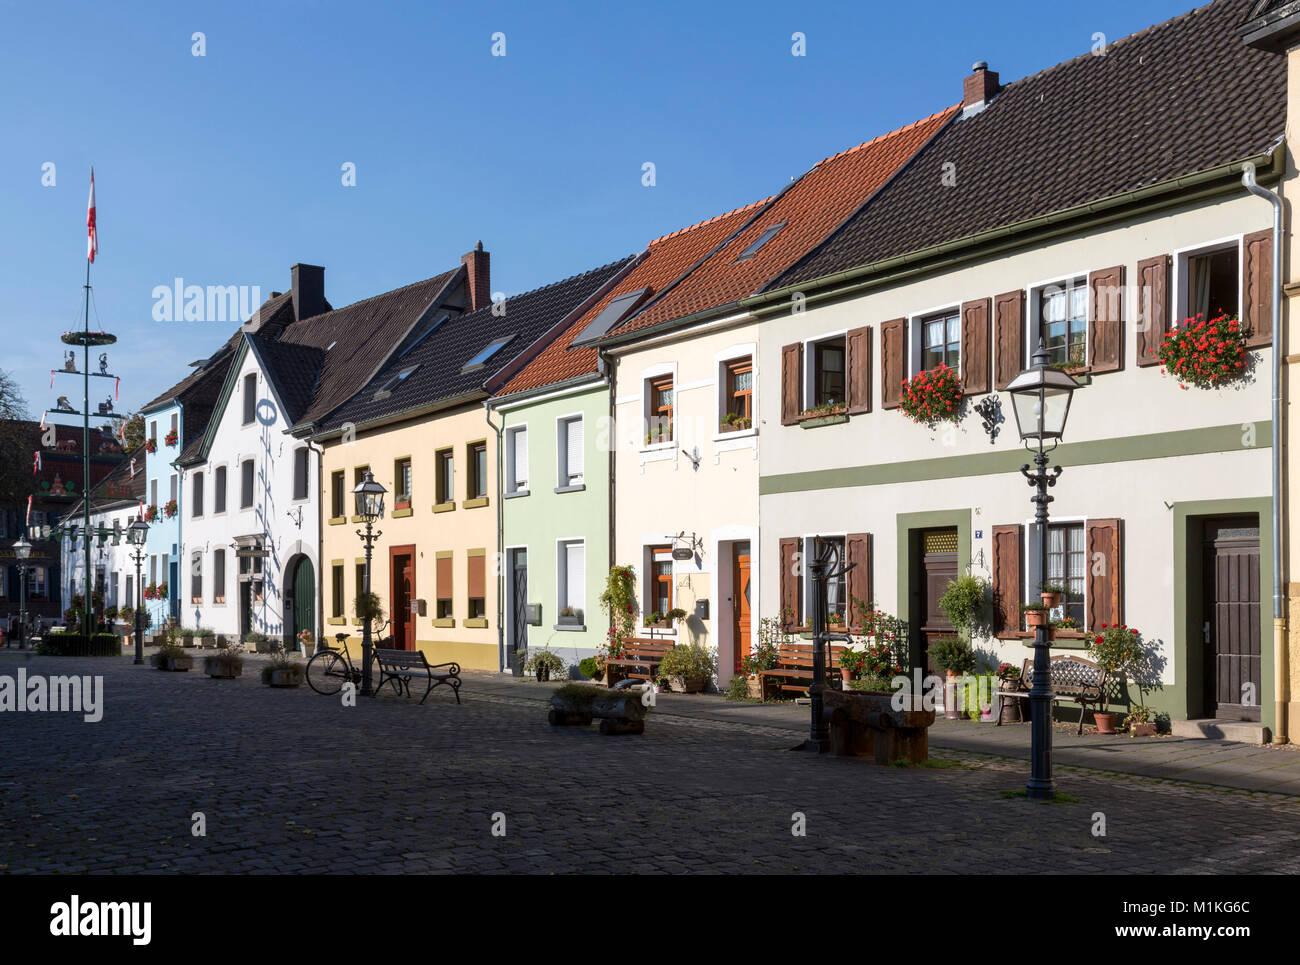 Krefeld, Ortsteil Linn, Andreasmarkt, Häuserzeile - Stock Image